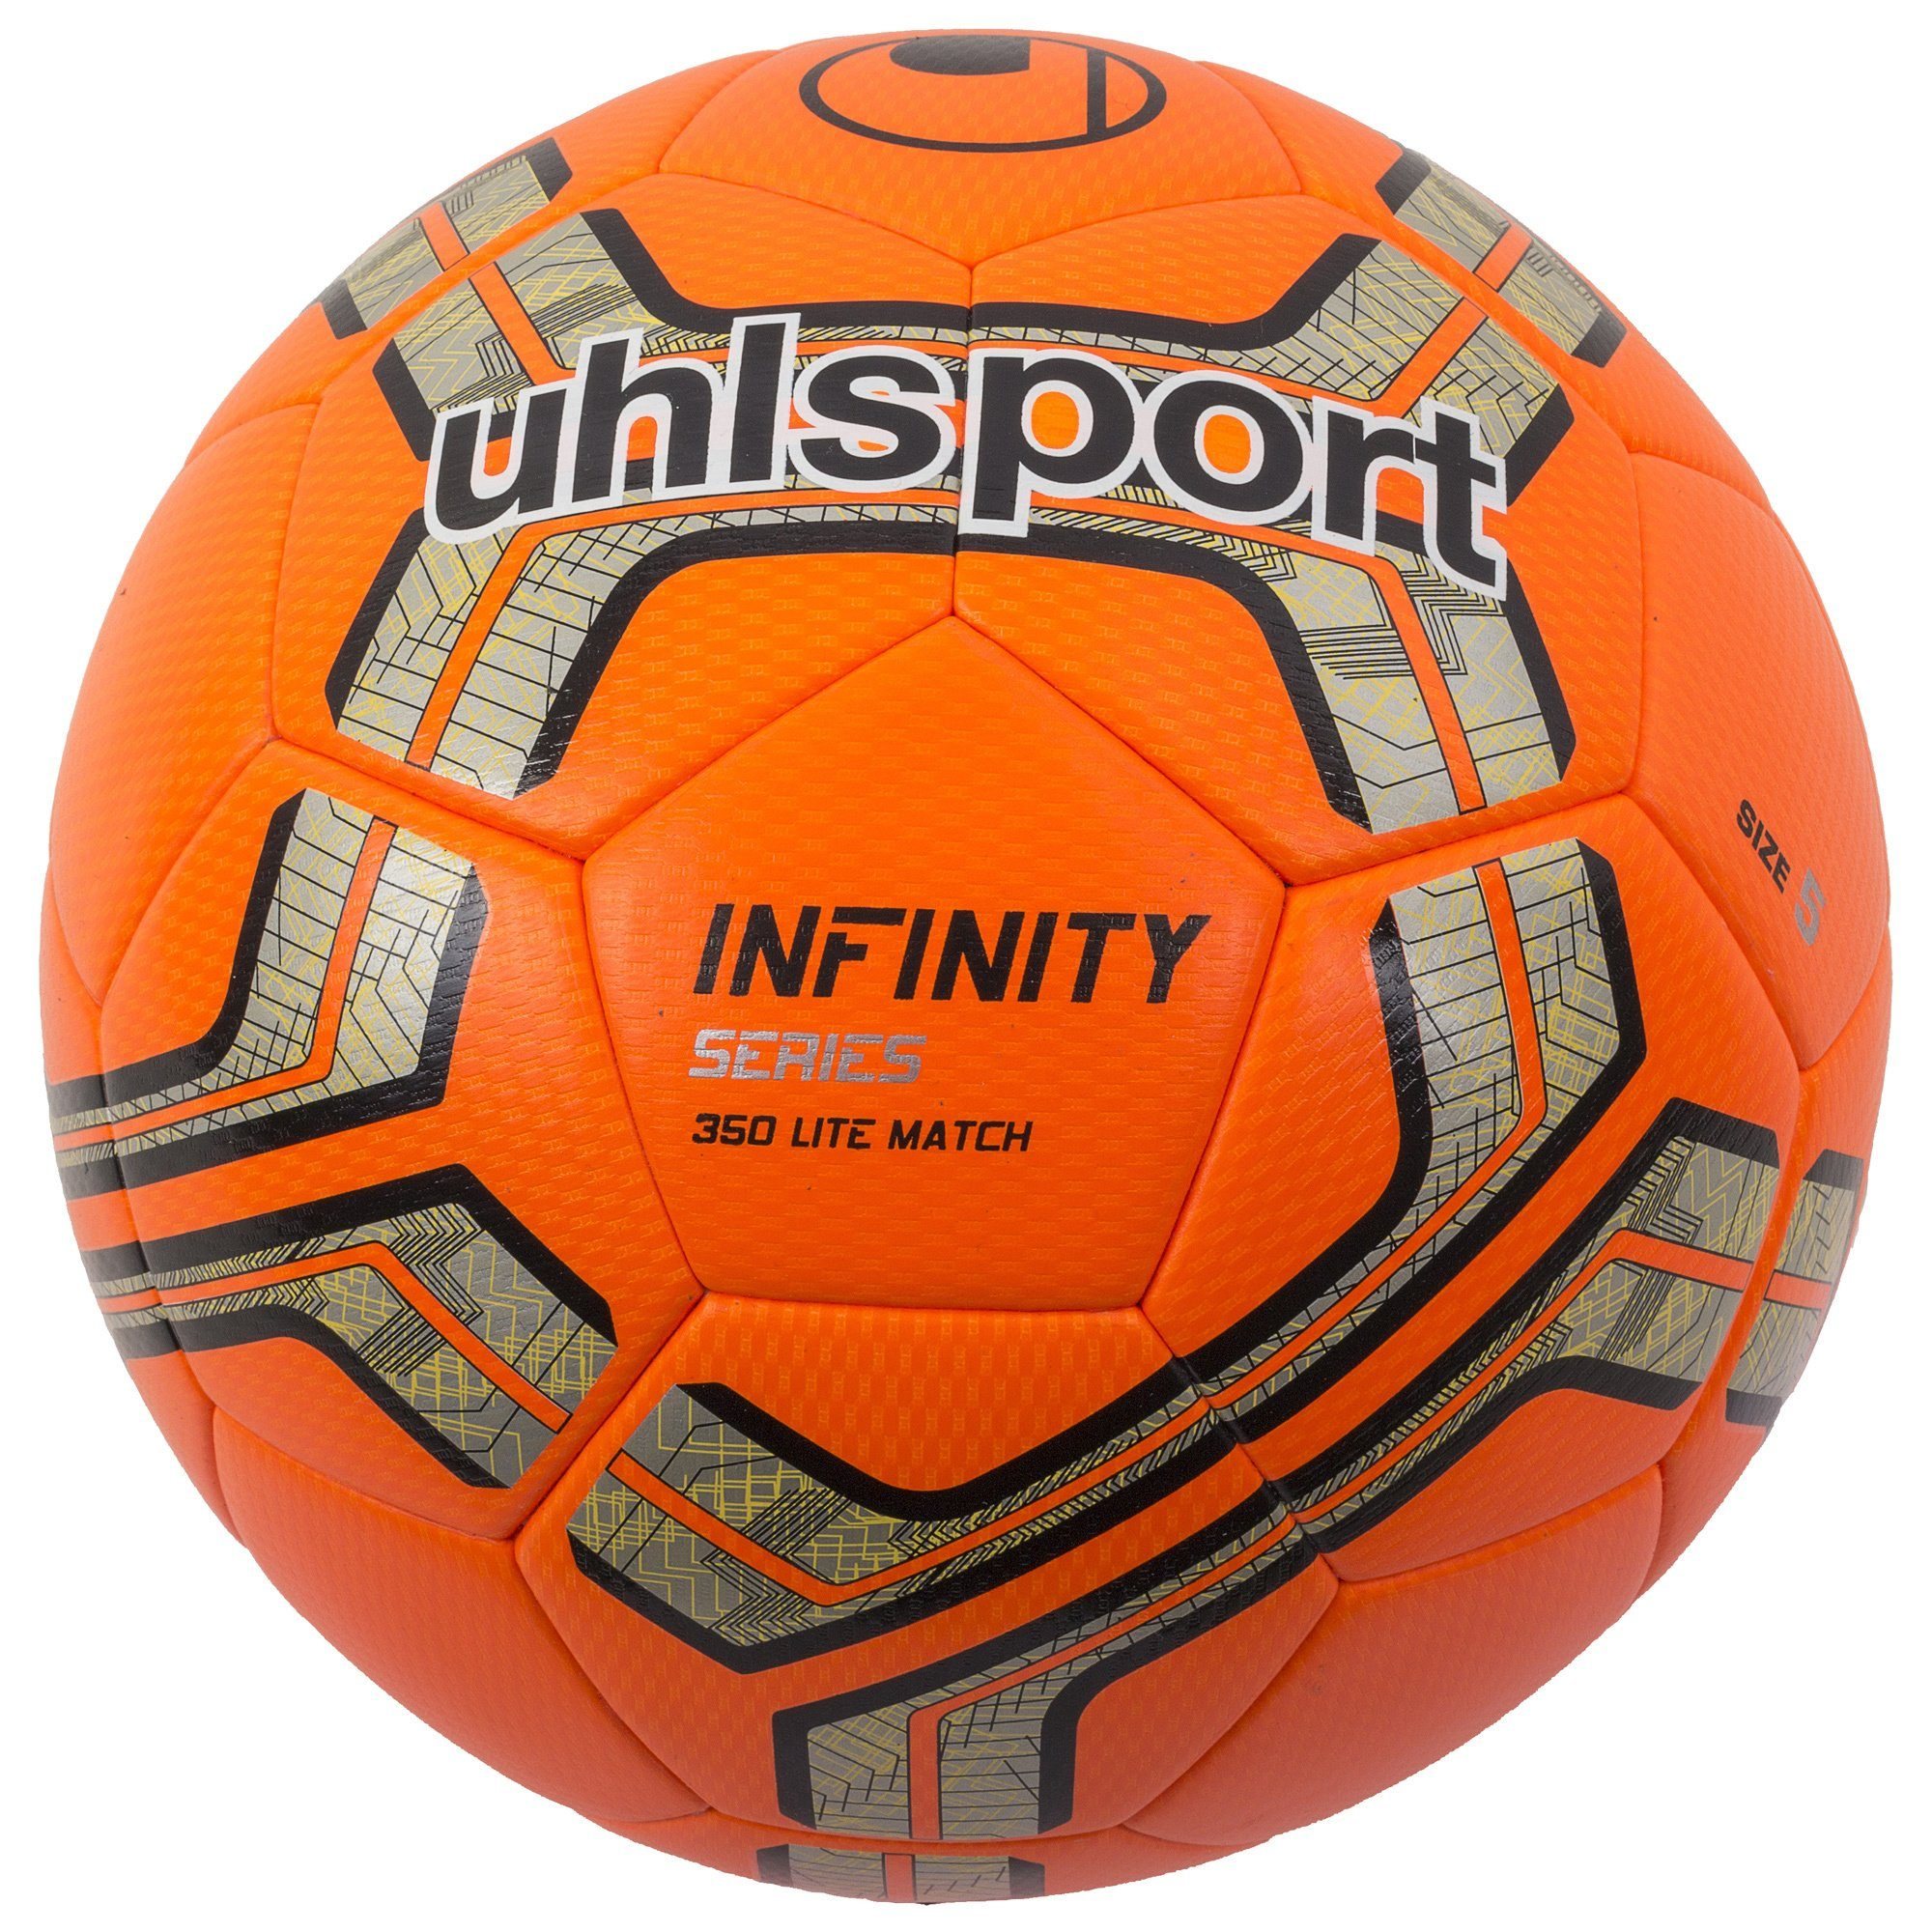 UHLSPORT Infinity Lite 350 Match 2.0 Fußball